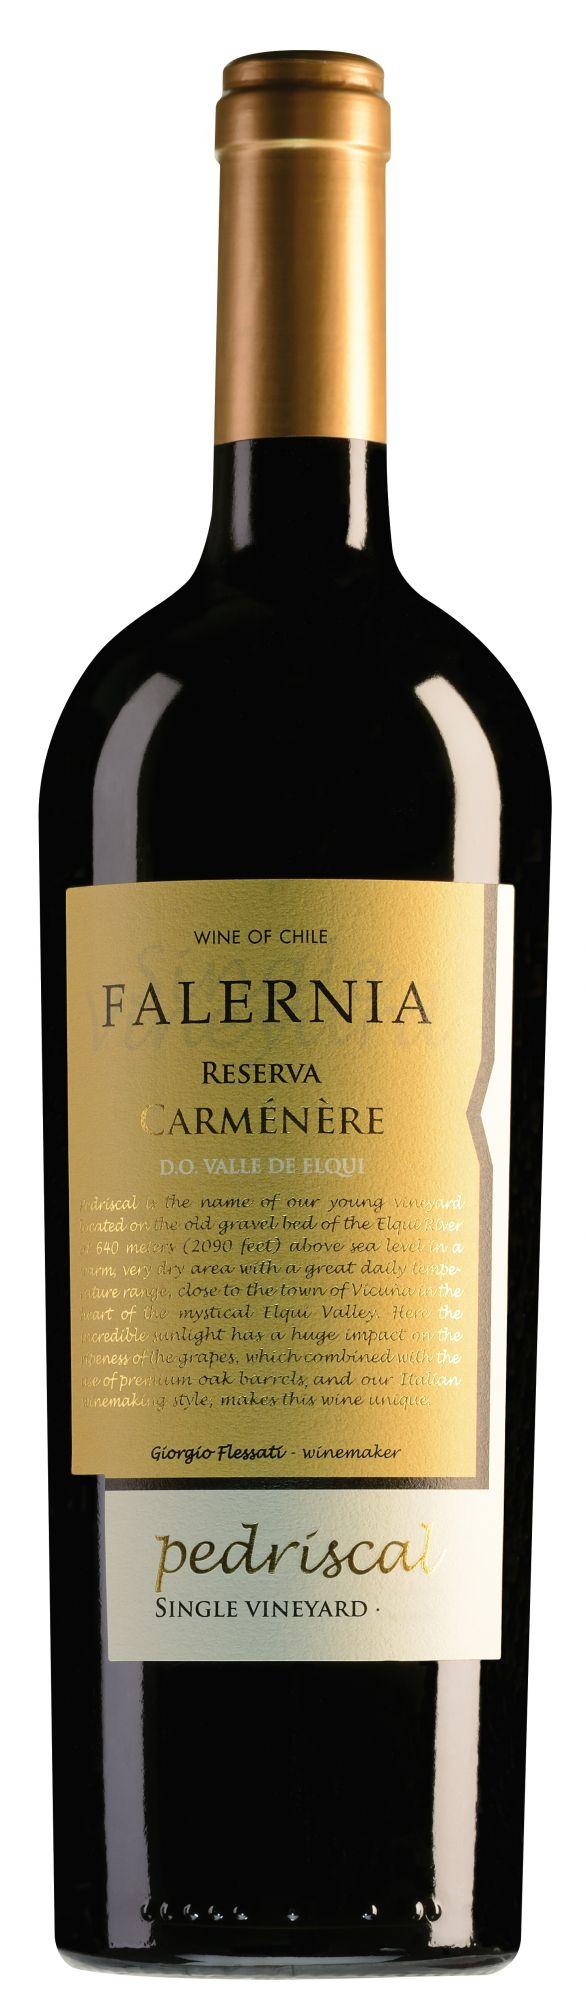 Viña Falernia Elqui Valley Pedriscal Carmenère